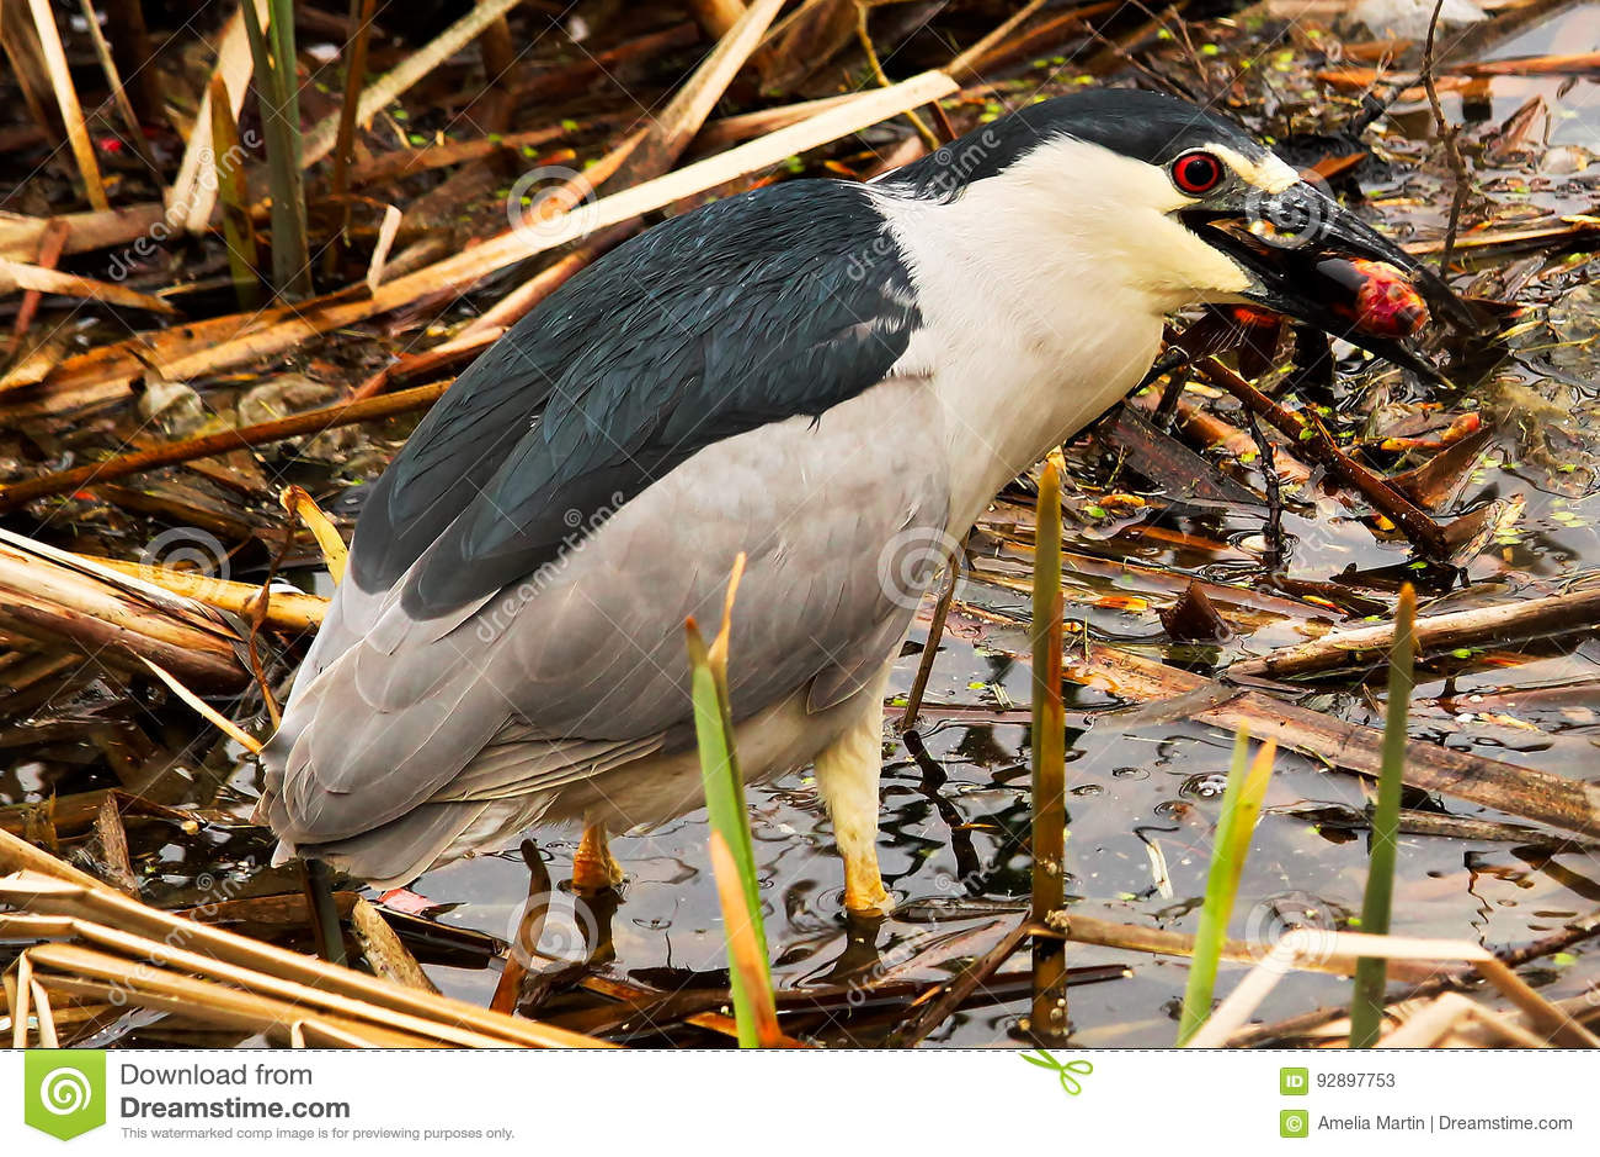 A Black Crown Night Heron eating a fish